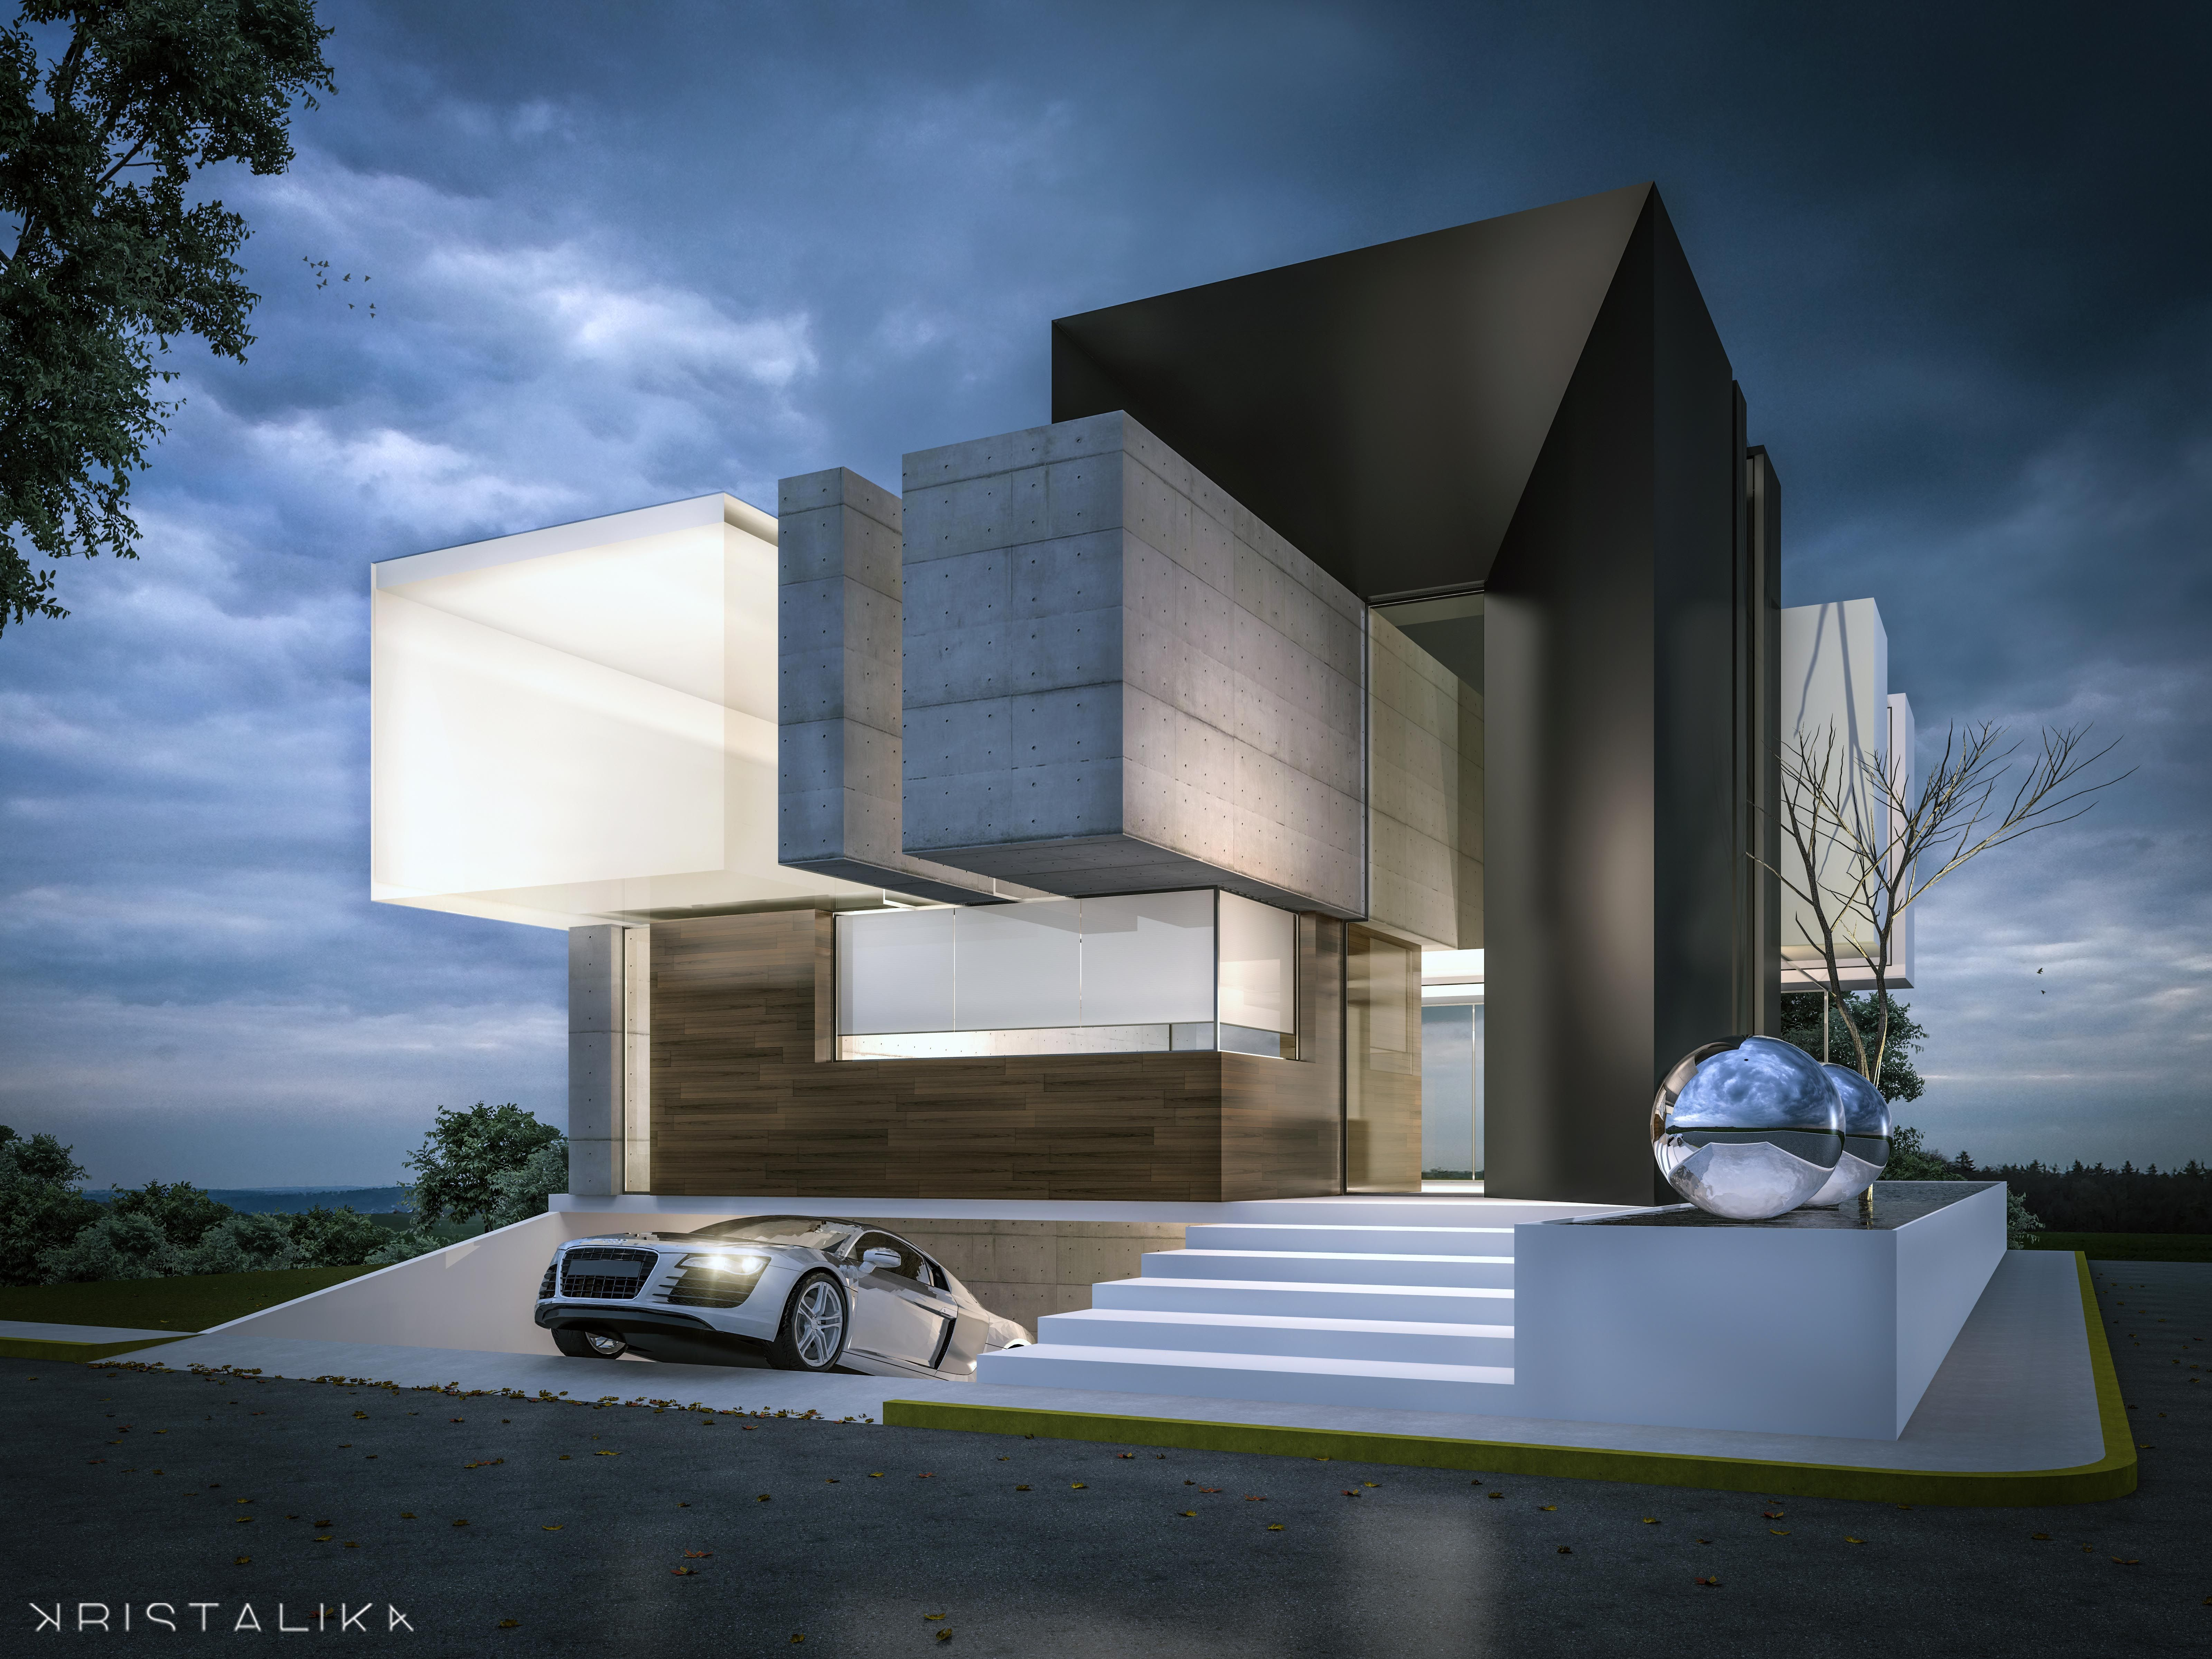 pinterest falalalaland snapchatt joycenieves. Black Bedroom Furniture Sets. Home Design Ideas